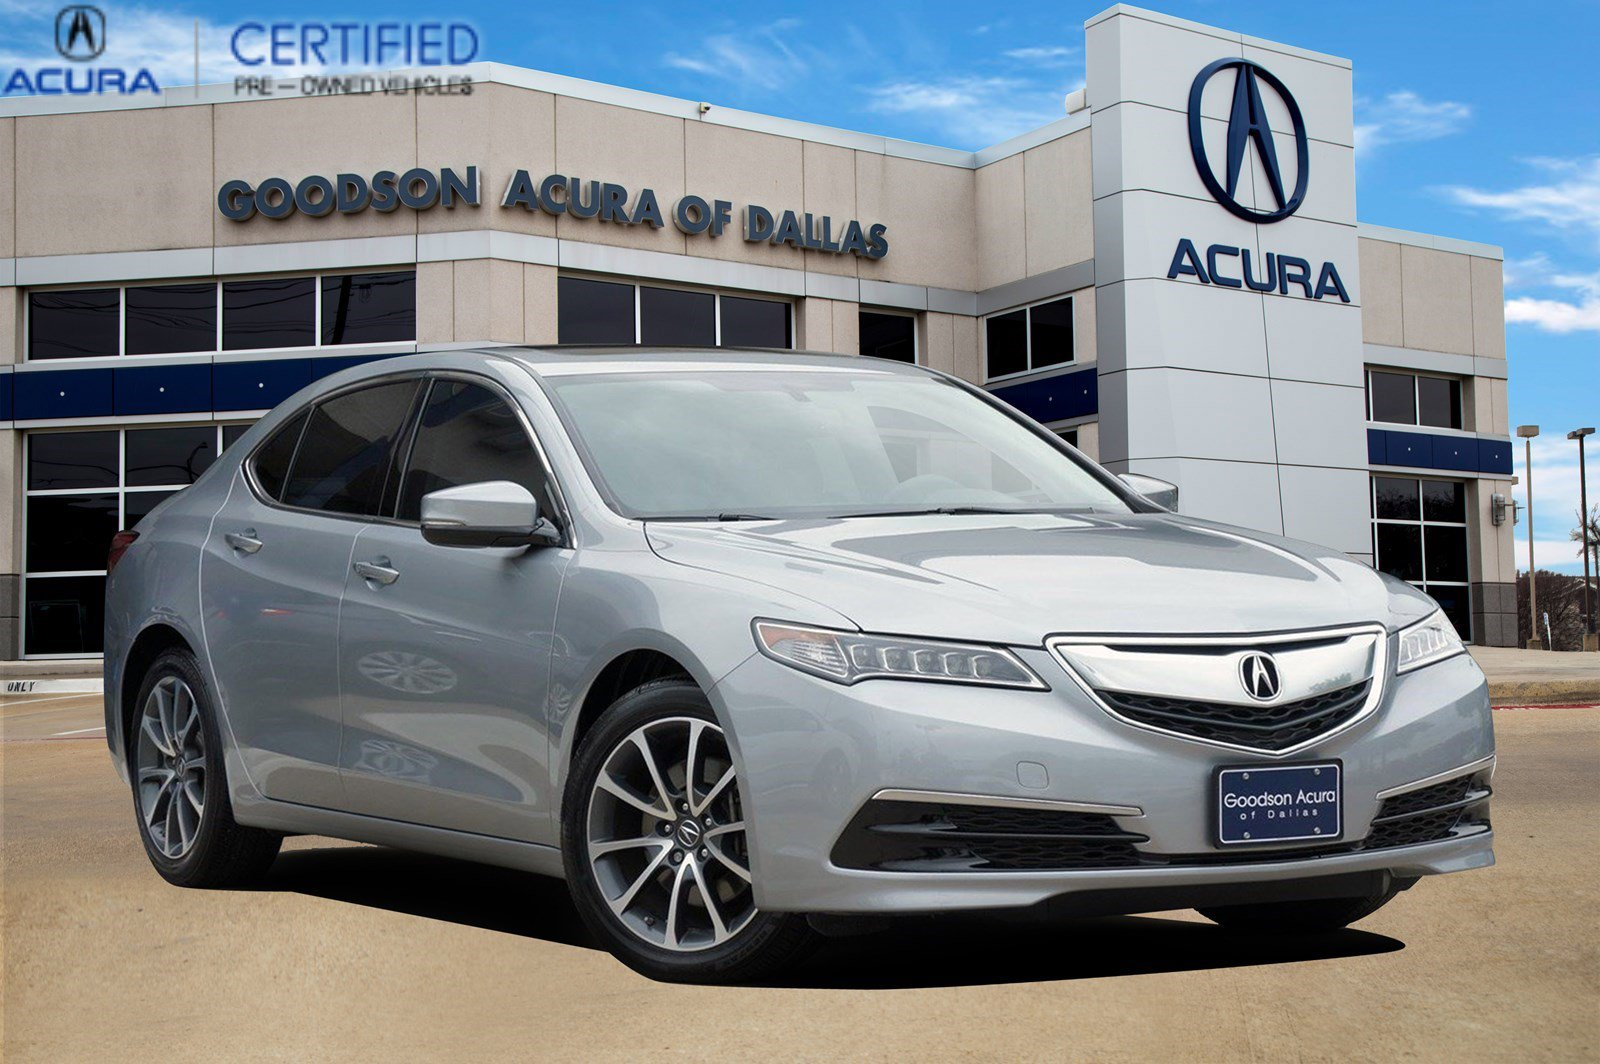 2017 Acura TLX V6 image